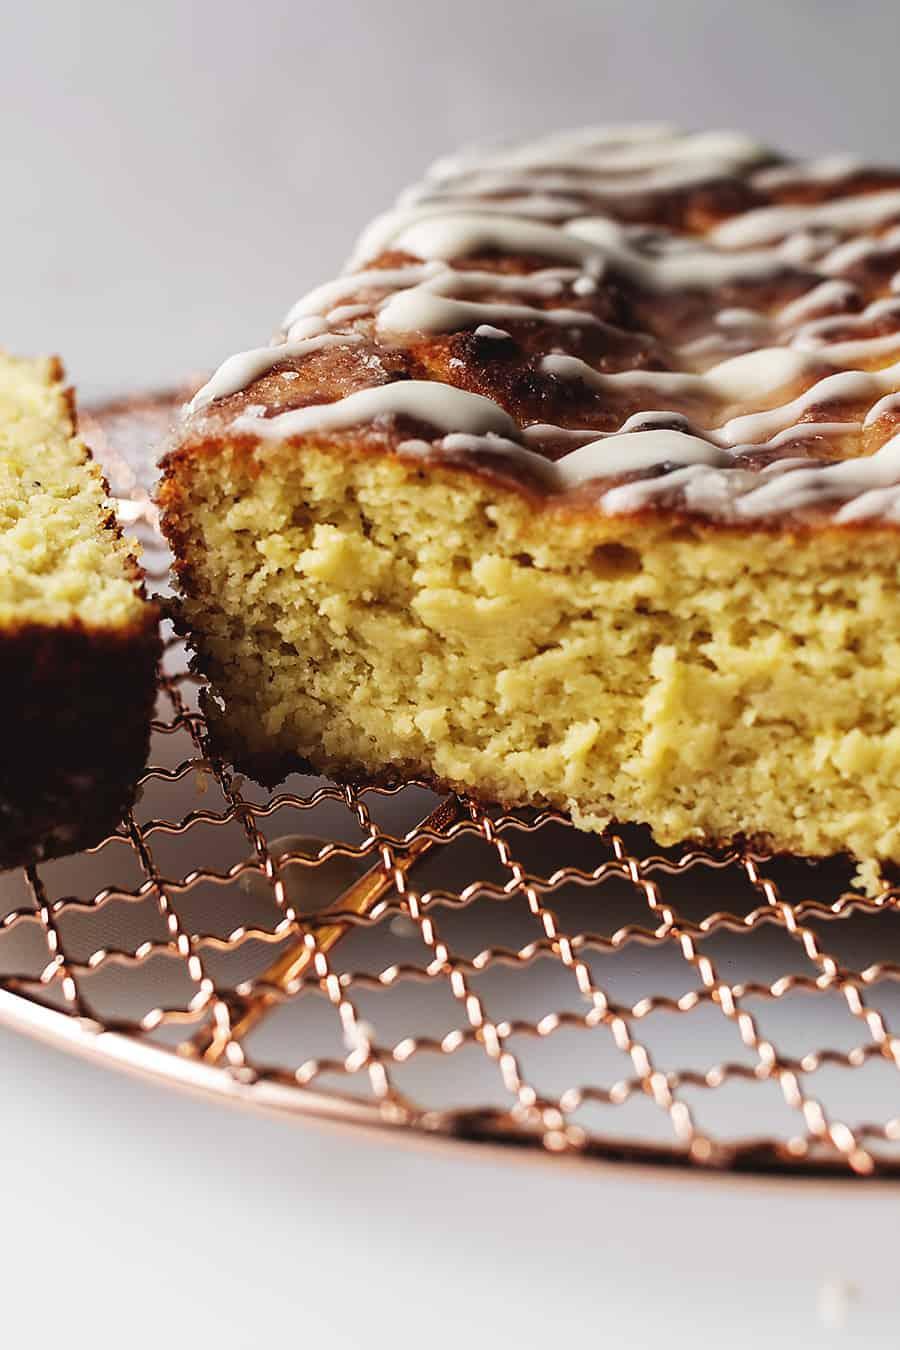 keto lemon pound cake on a gold coloring rack